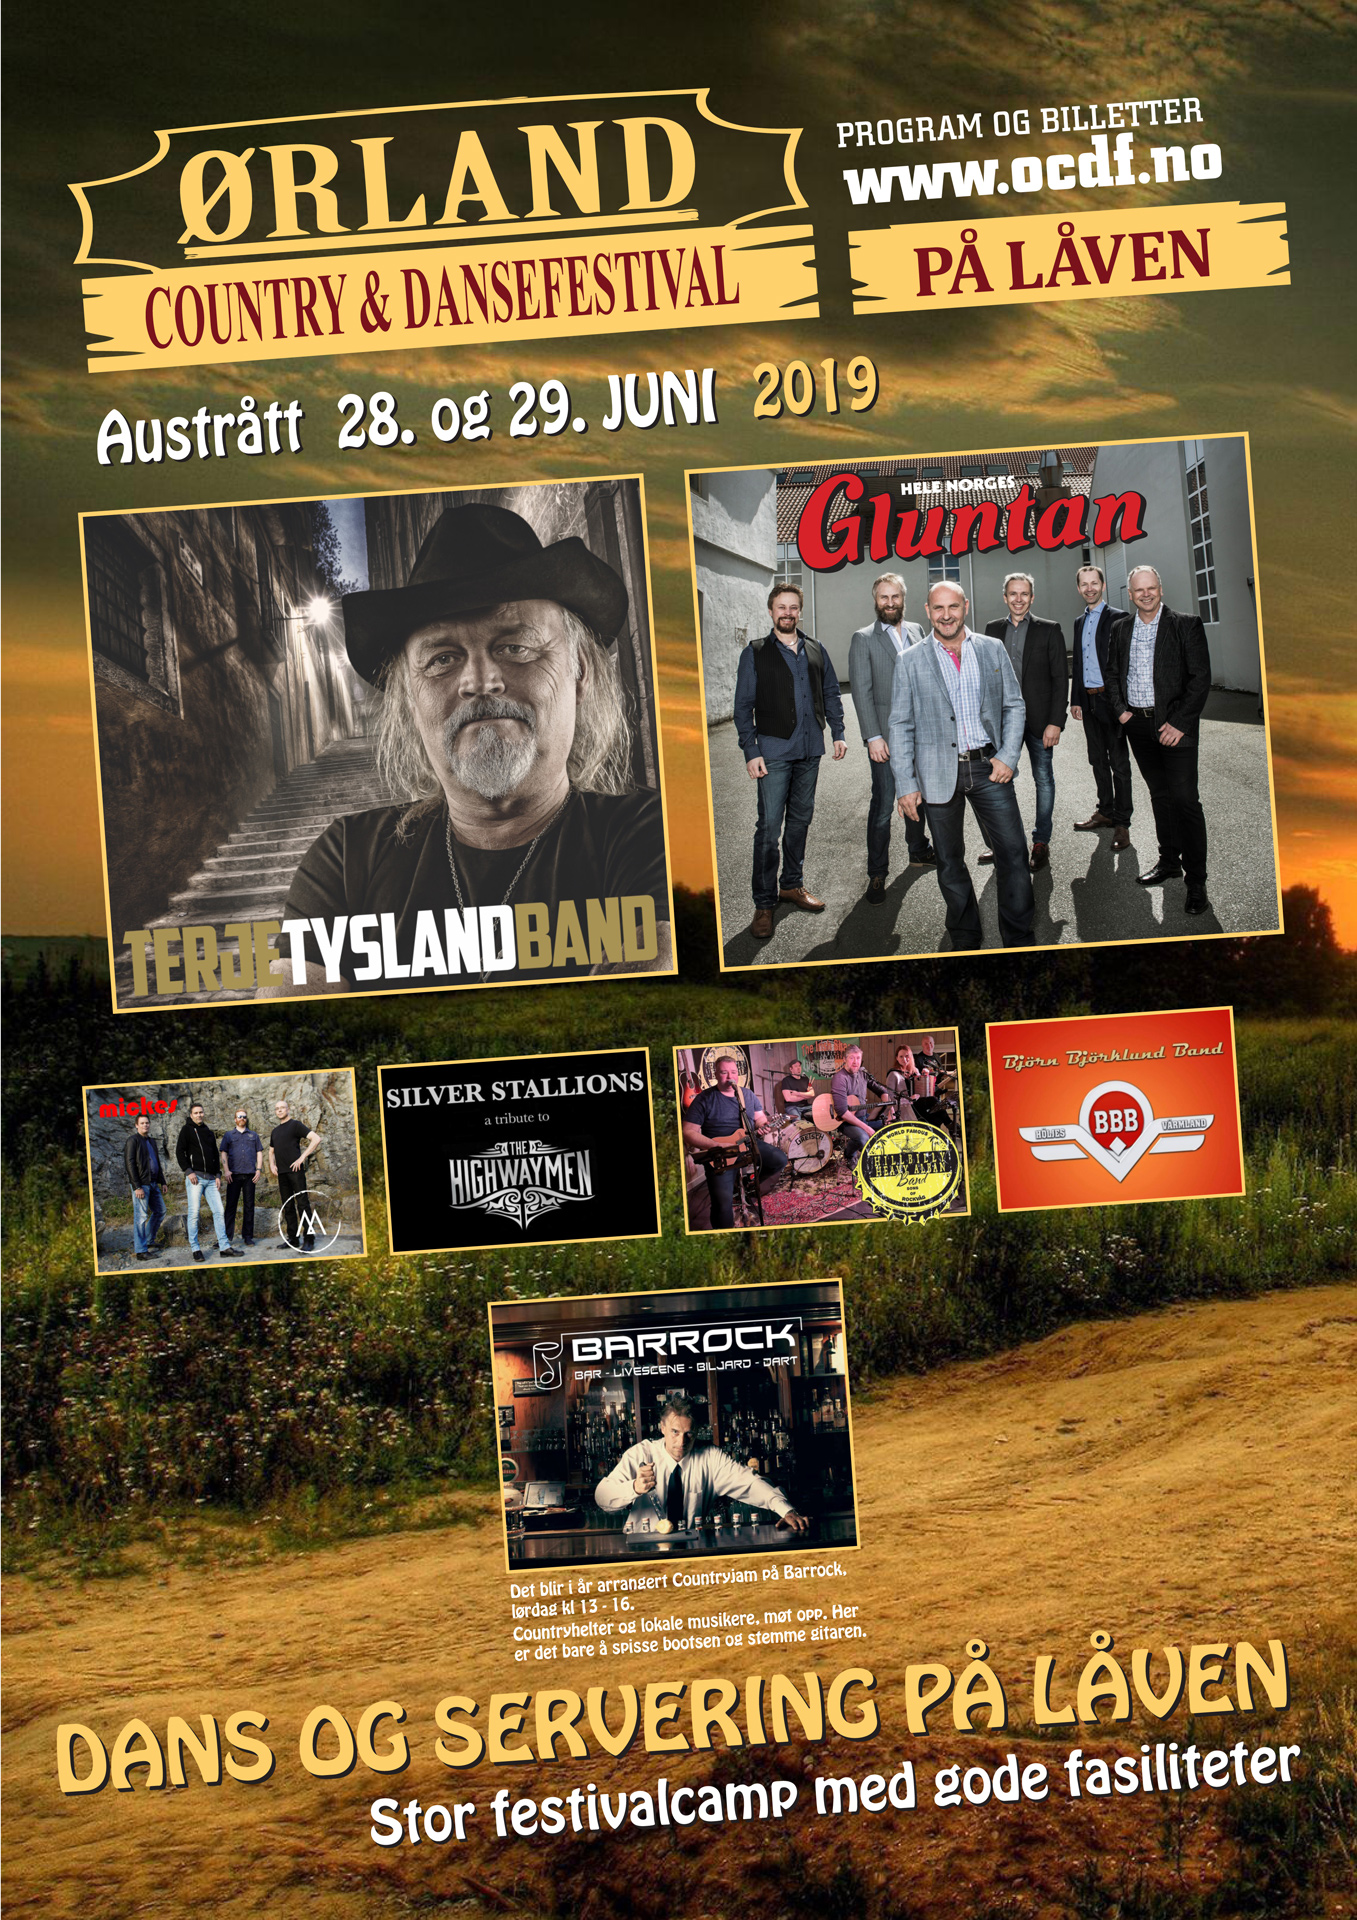 Ørland Country & Dansefestival 2019